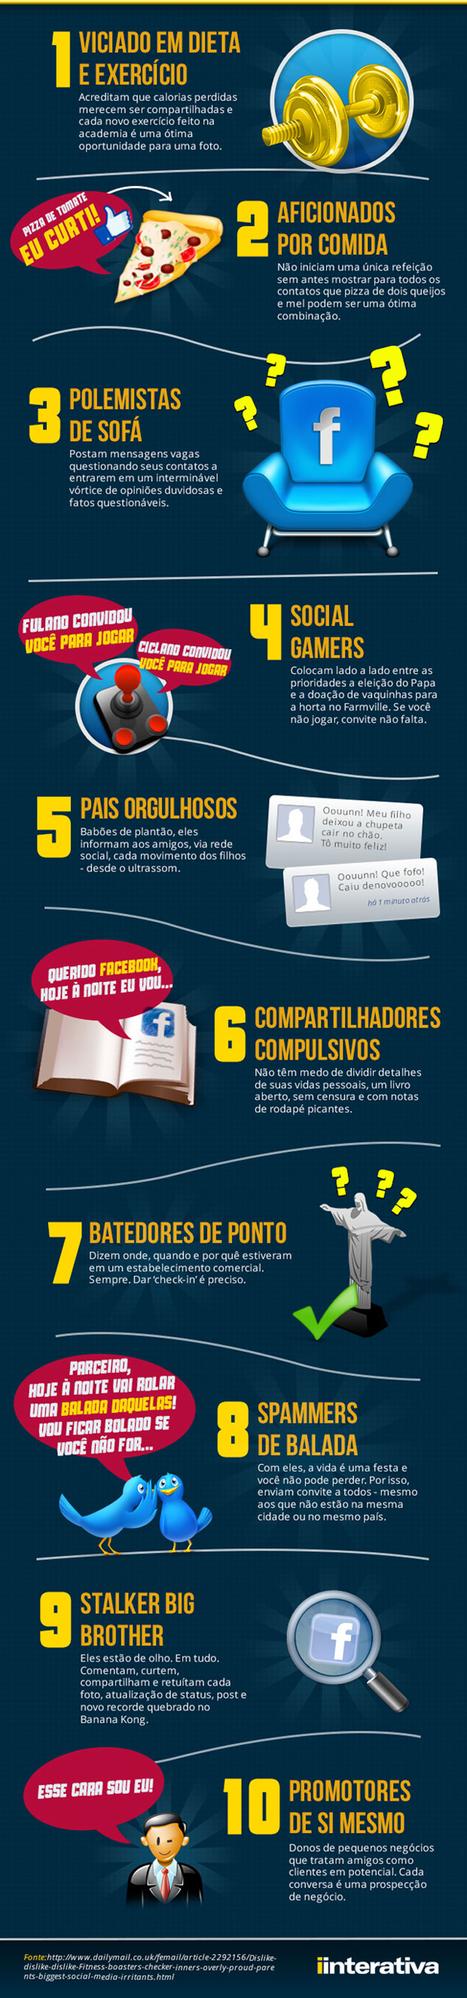 Infográfico traz os 10 tipos de usuários mais chatos nas redes sociais   Science, Technology and Society   Scoop.it